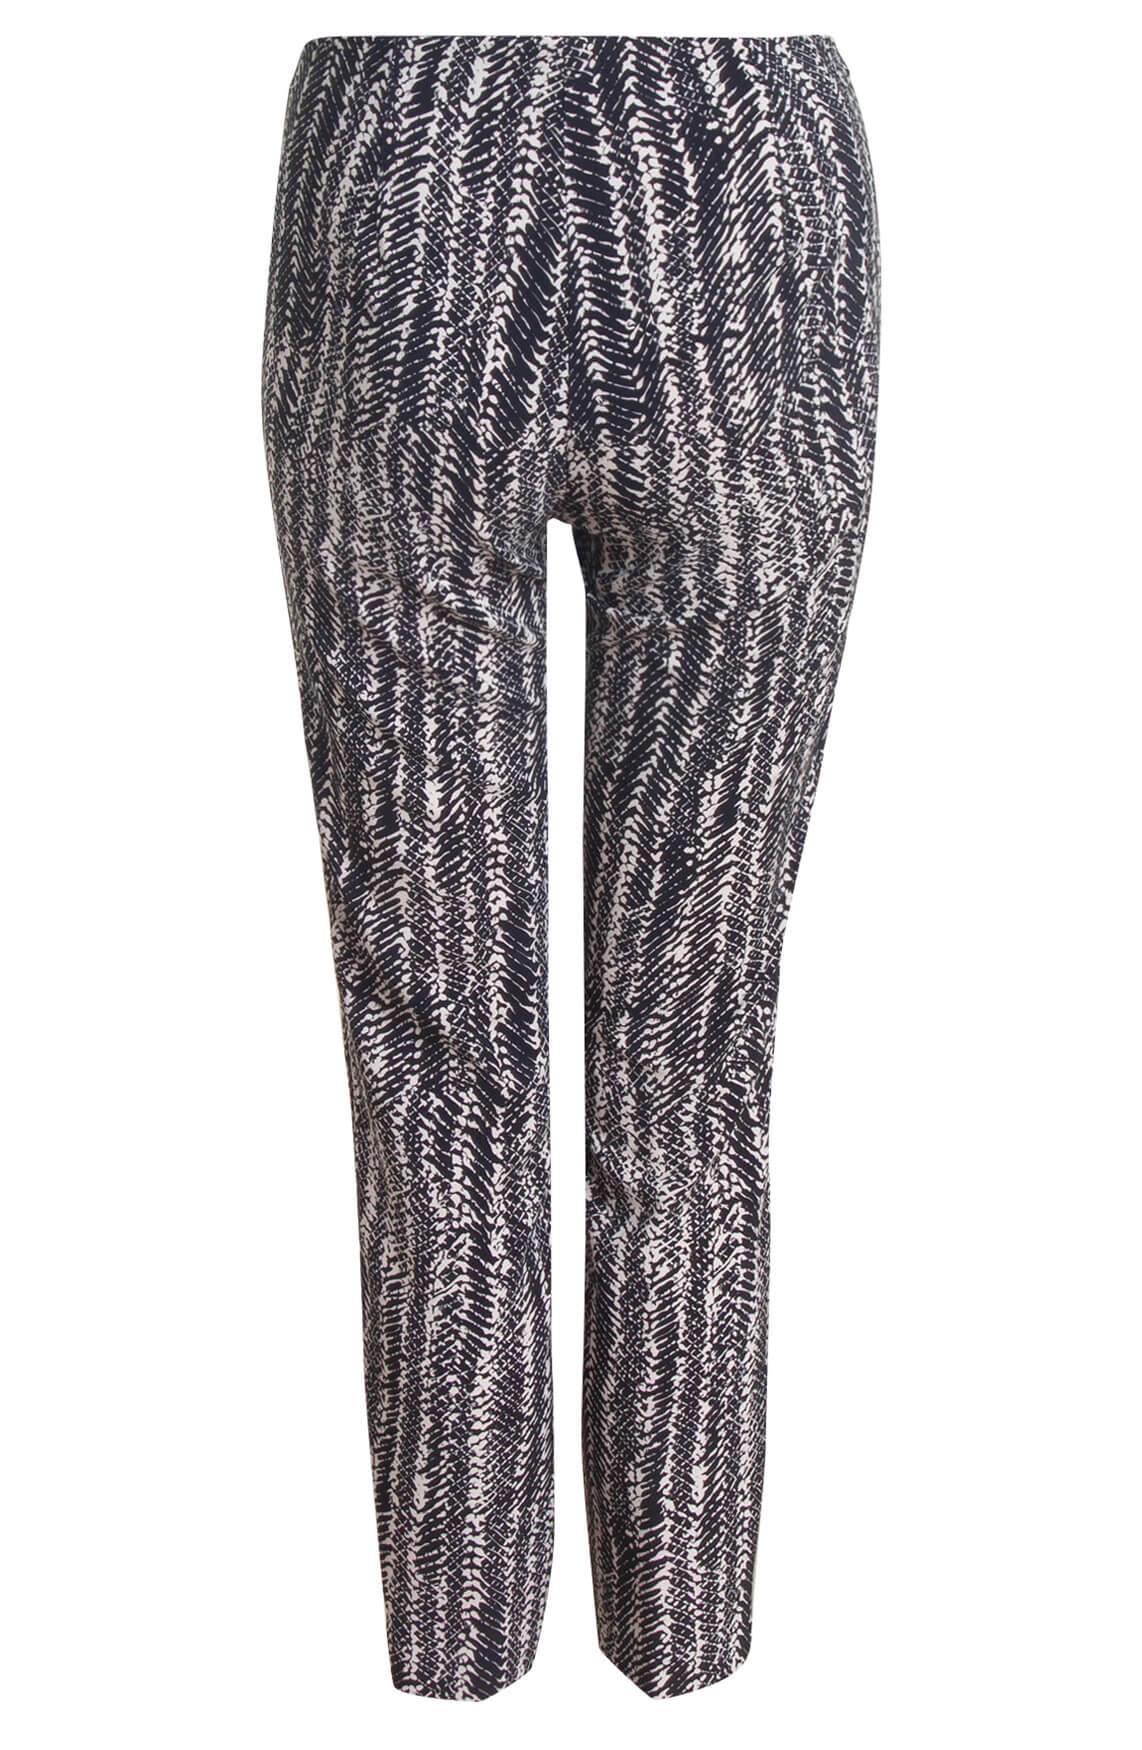 Rosner Dames L28 Antonia pantalon zwart